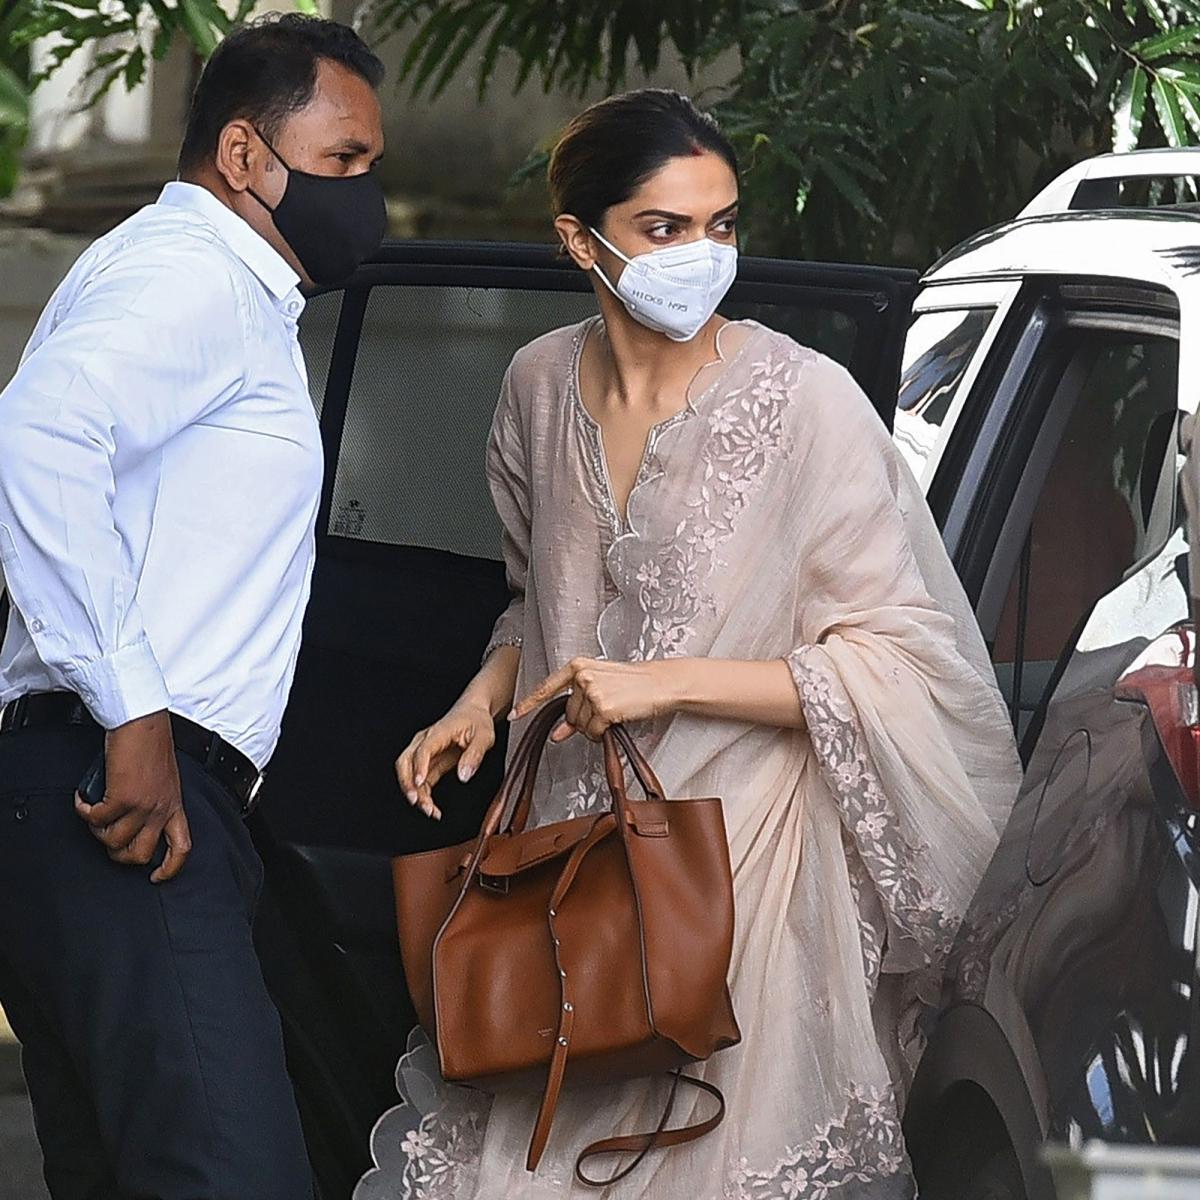 Bollywood-drugs nexus: NCB questions Deepika Padukone for five hours